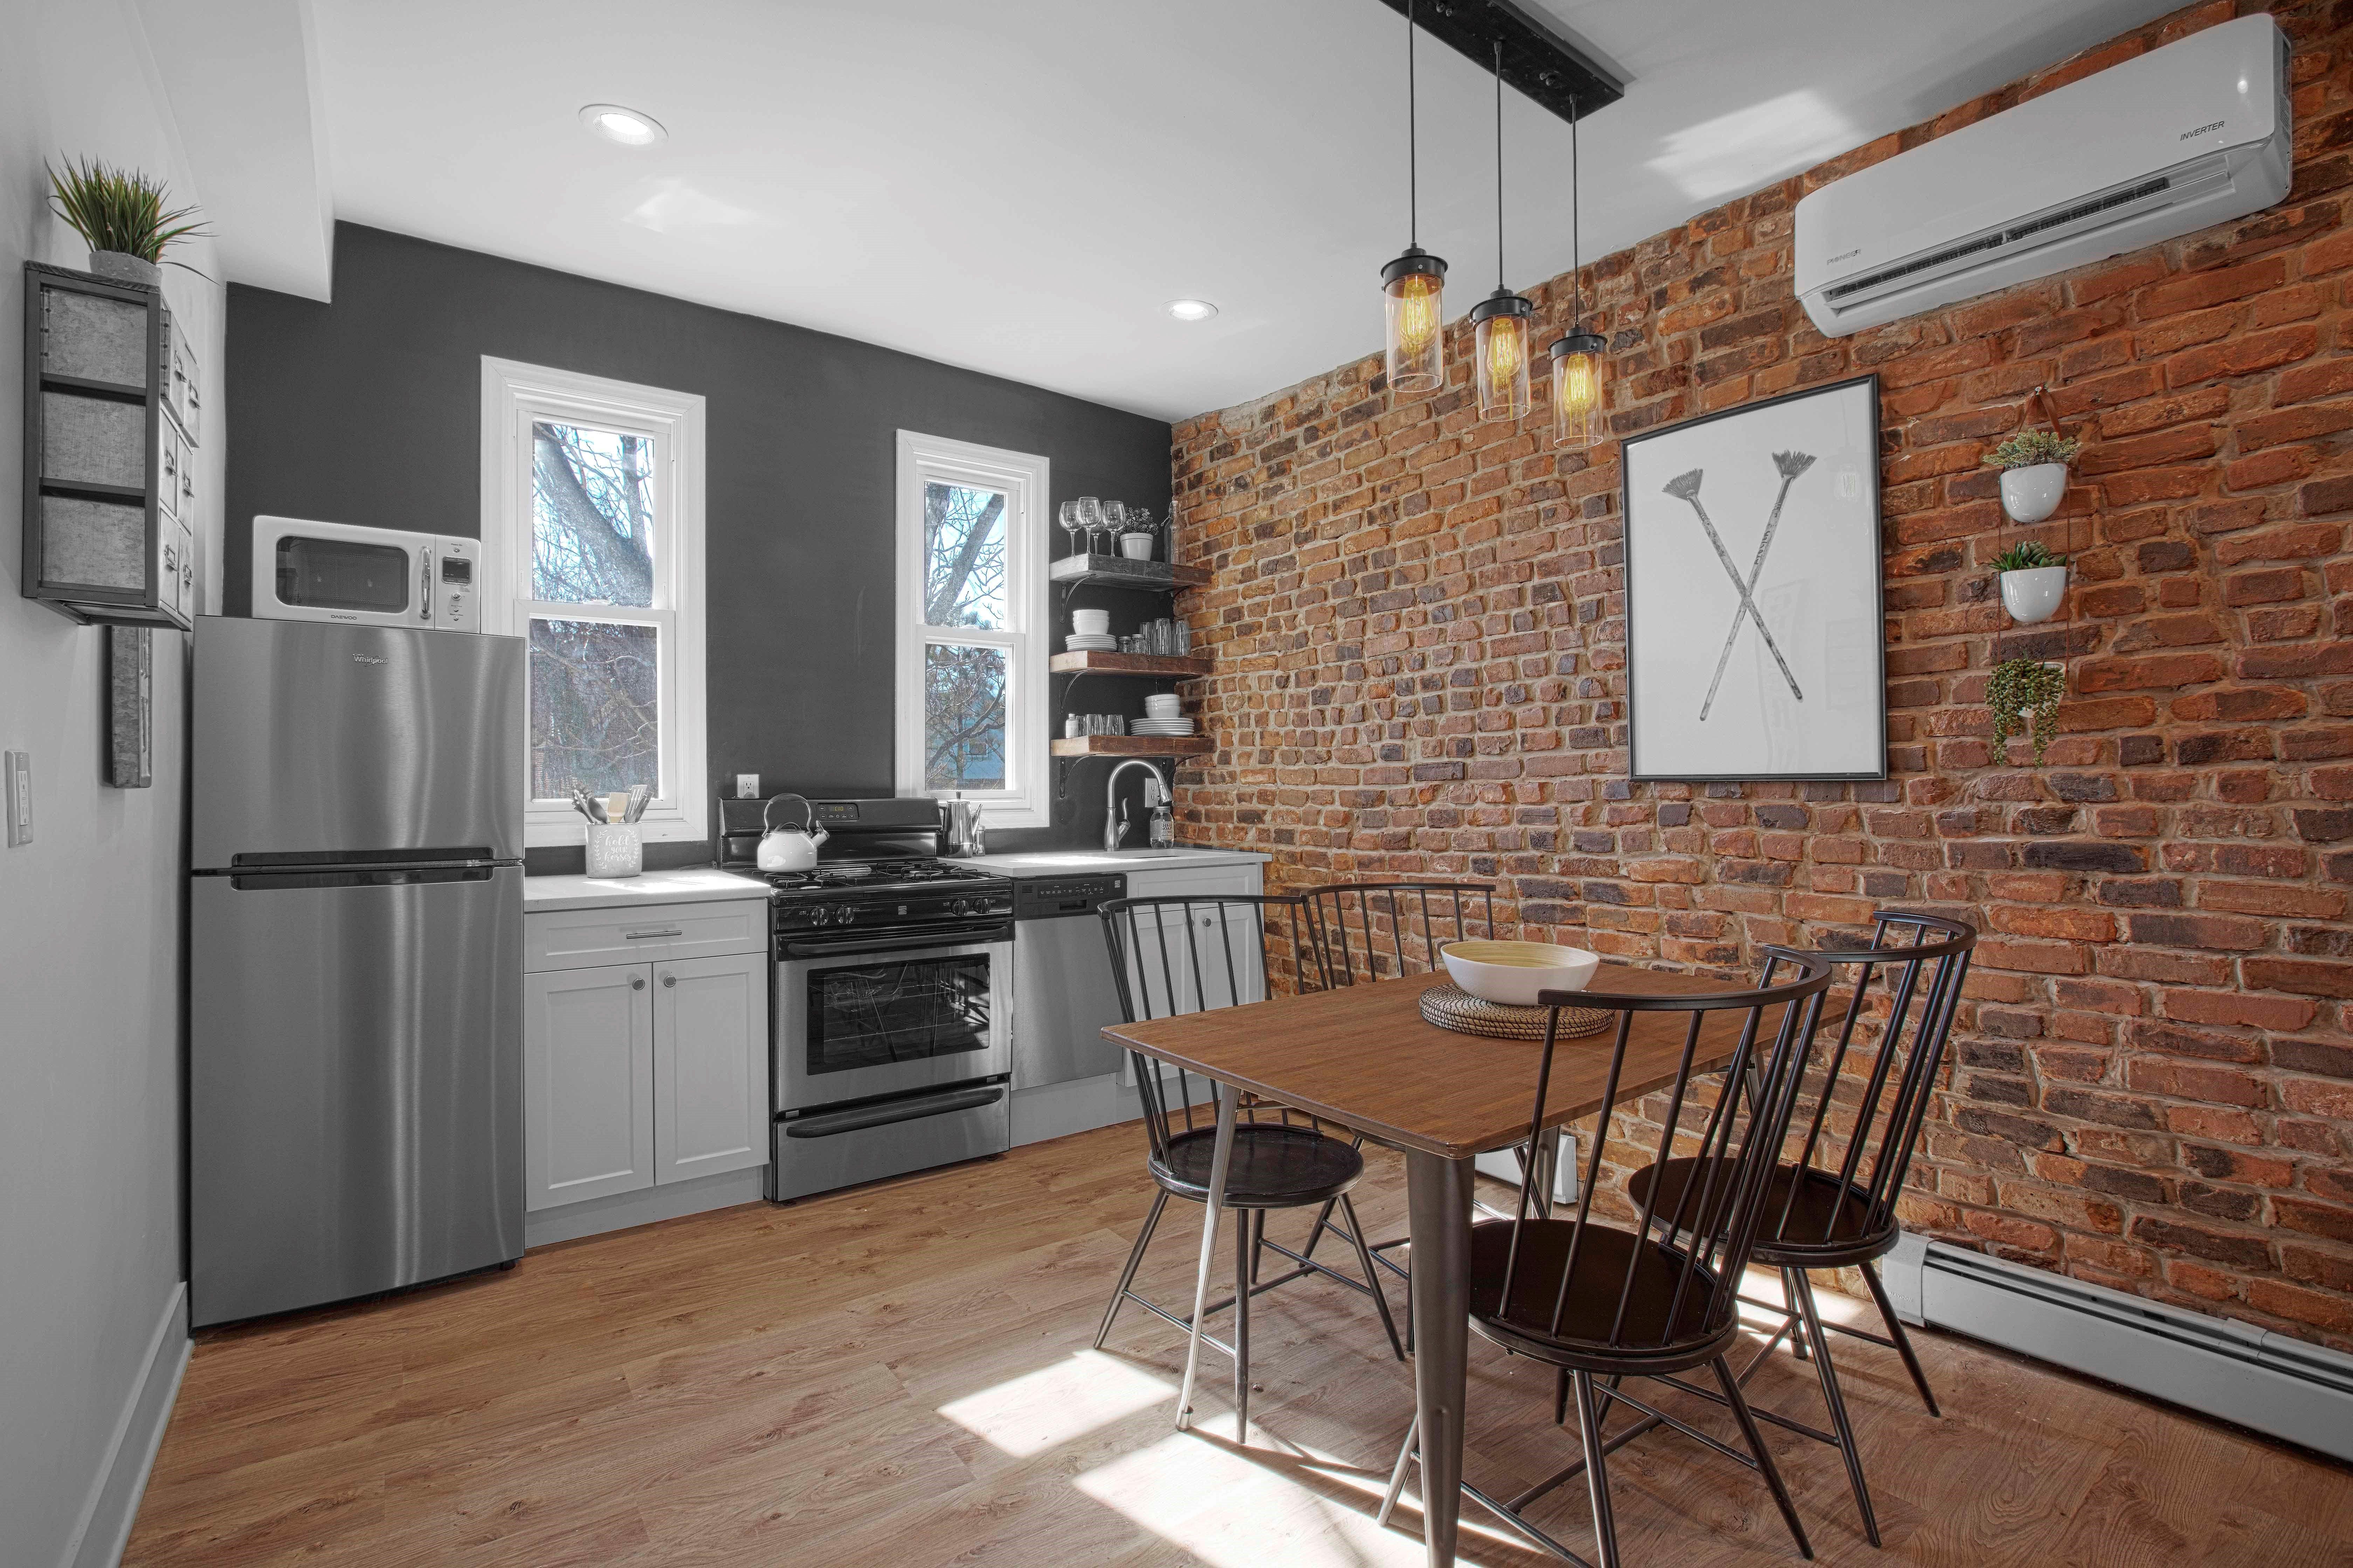 Kitchen Cabinets Jersey City - Iwn Kitchen